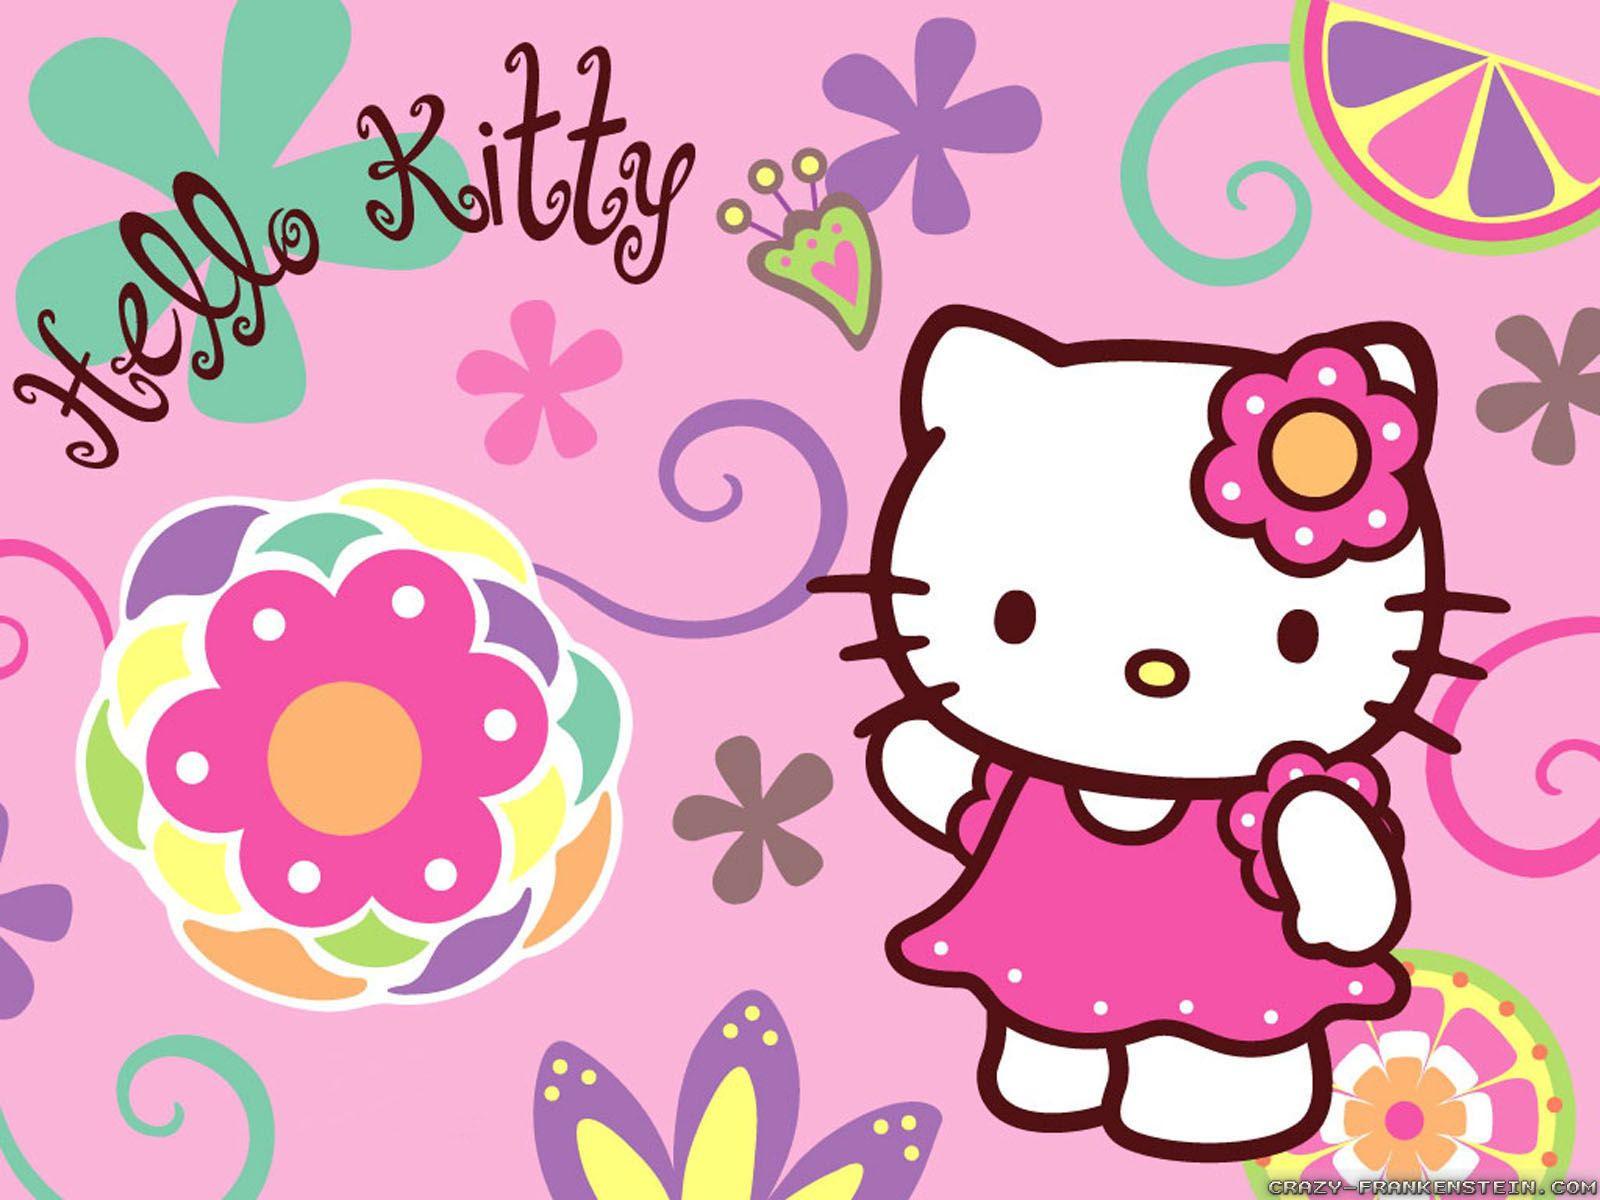 File Hello Kitty Wallpapers SAJ9868jpg   4USkY 1600x1200